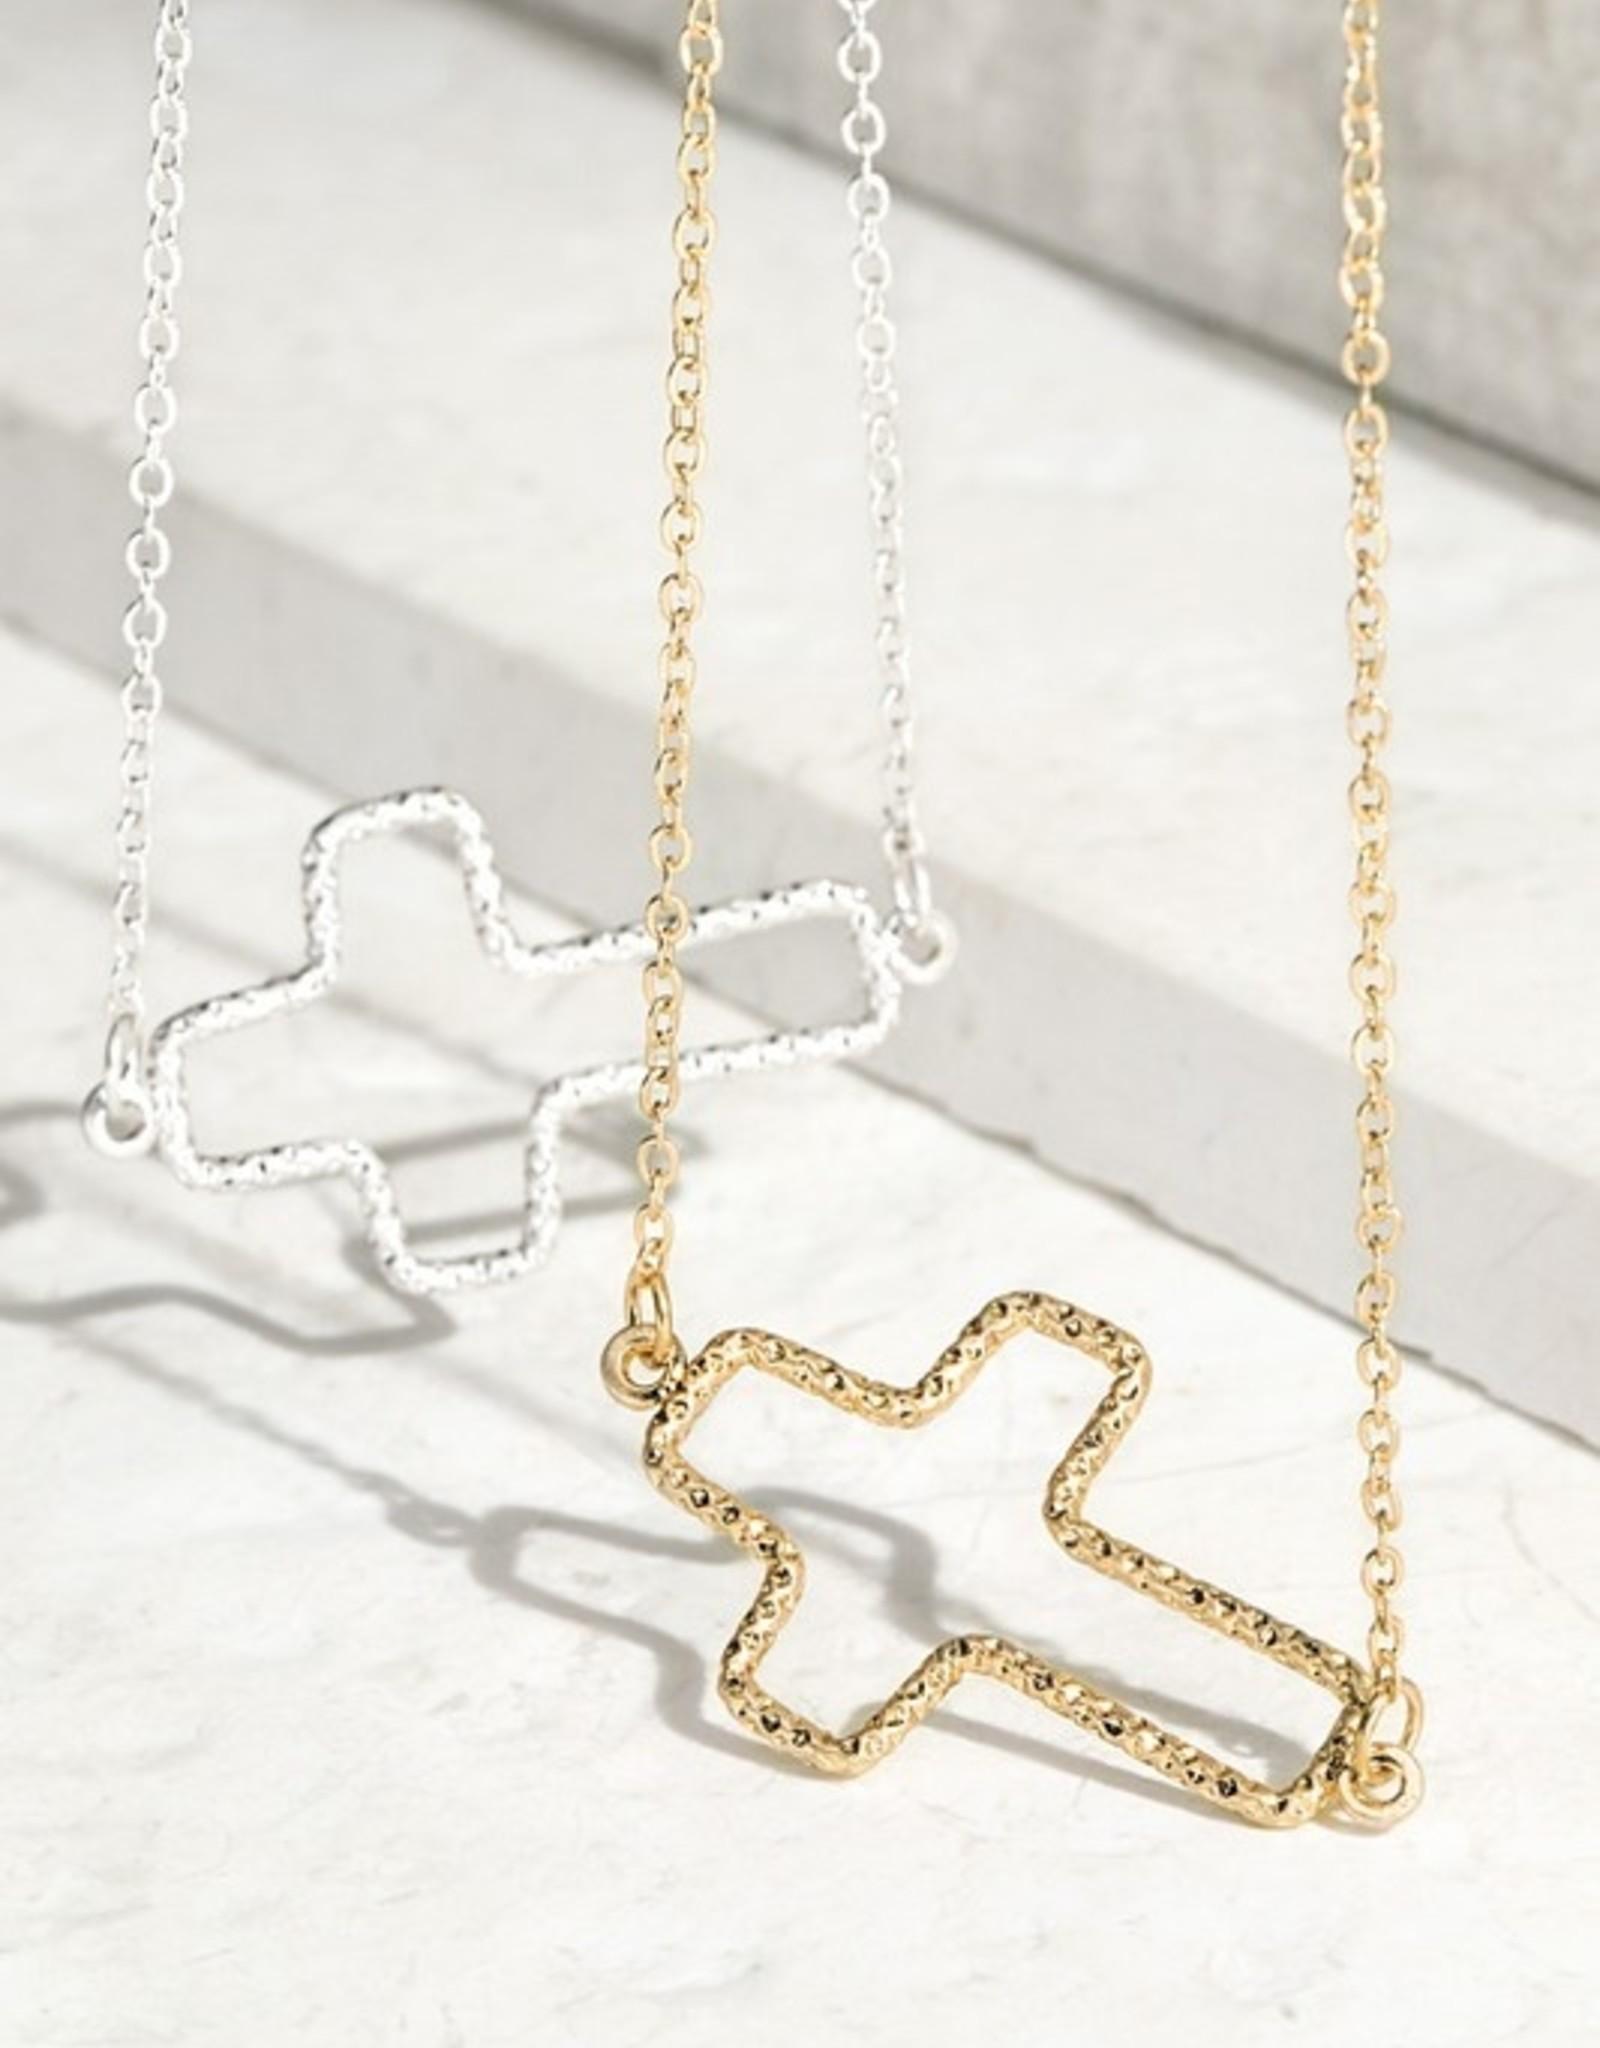 Open cross necklace